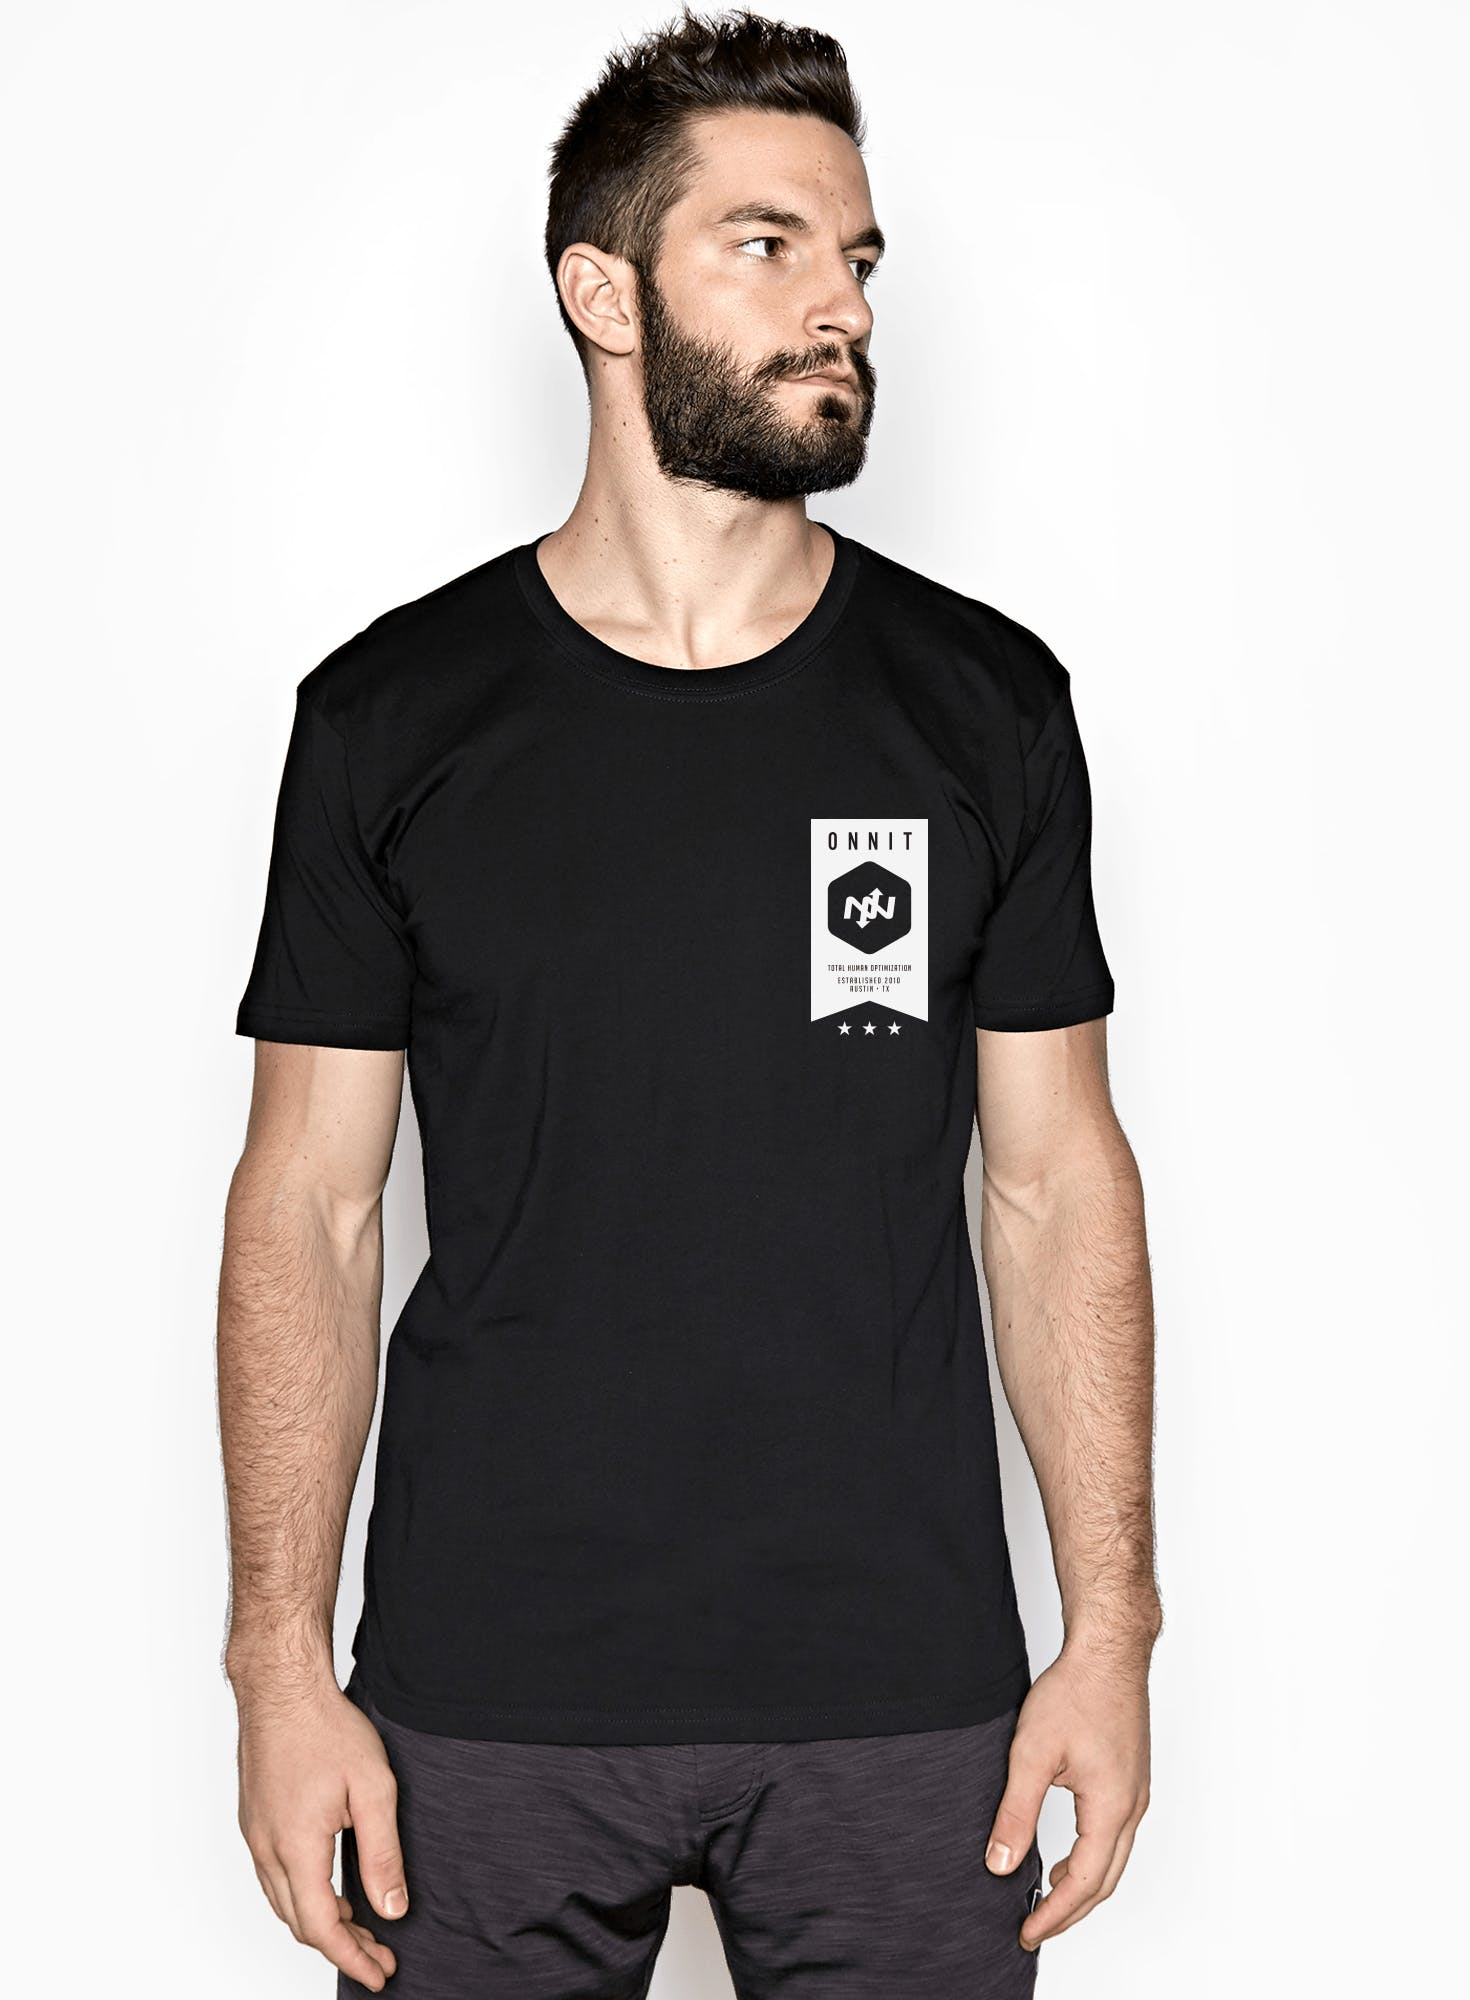 Pennant Organic Cotton T-Shirt